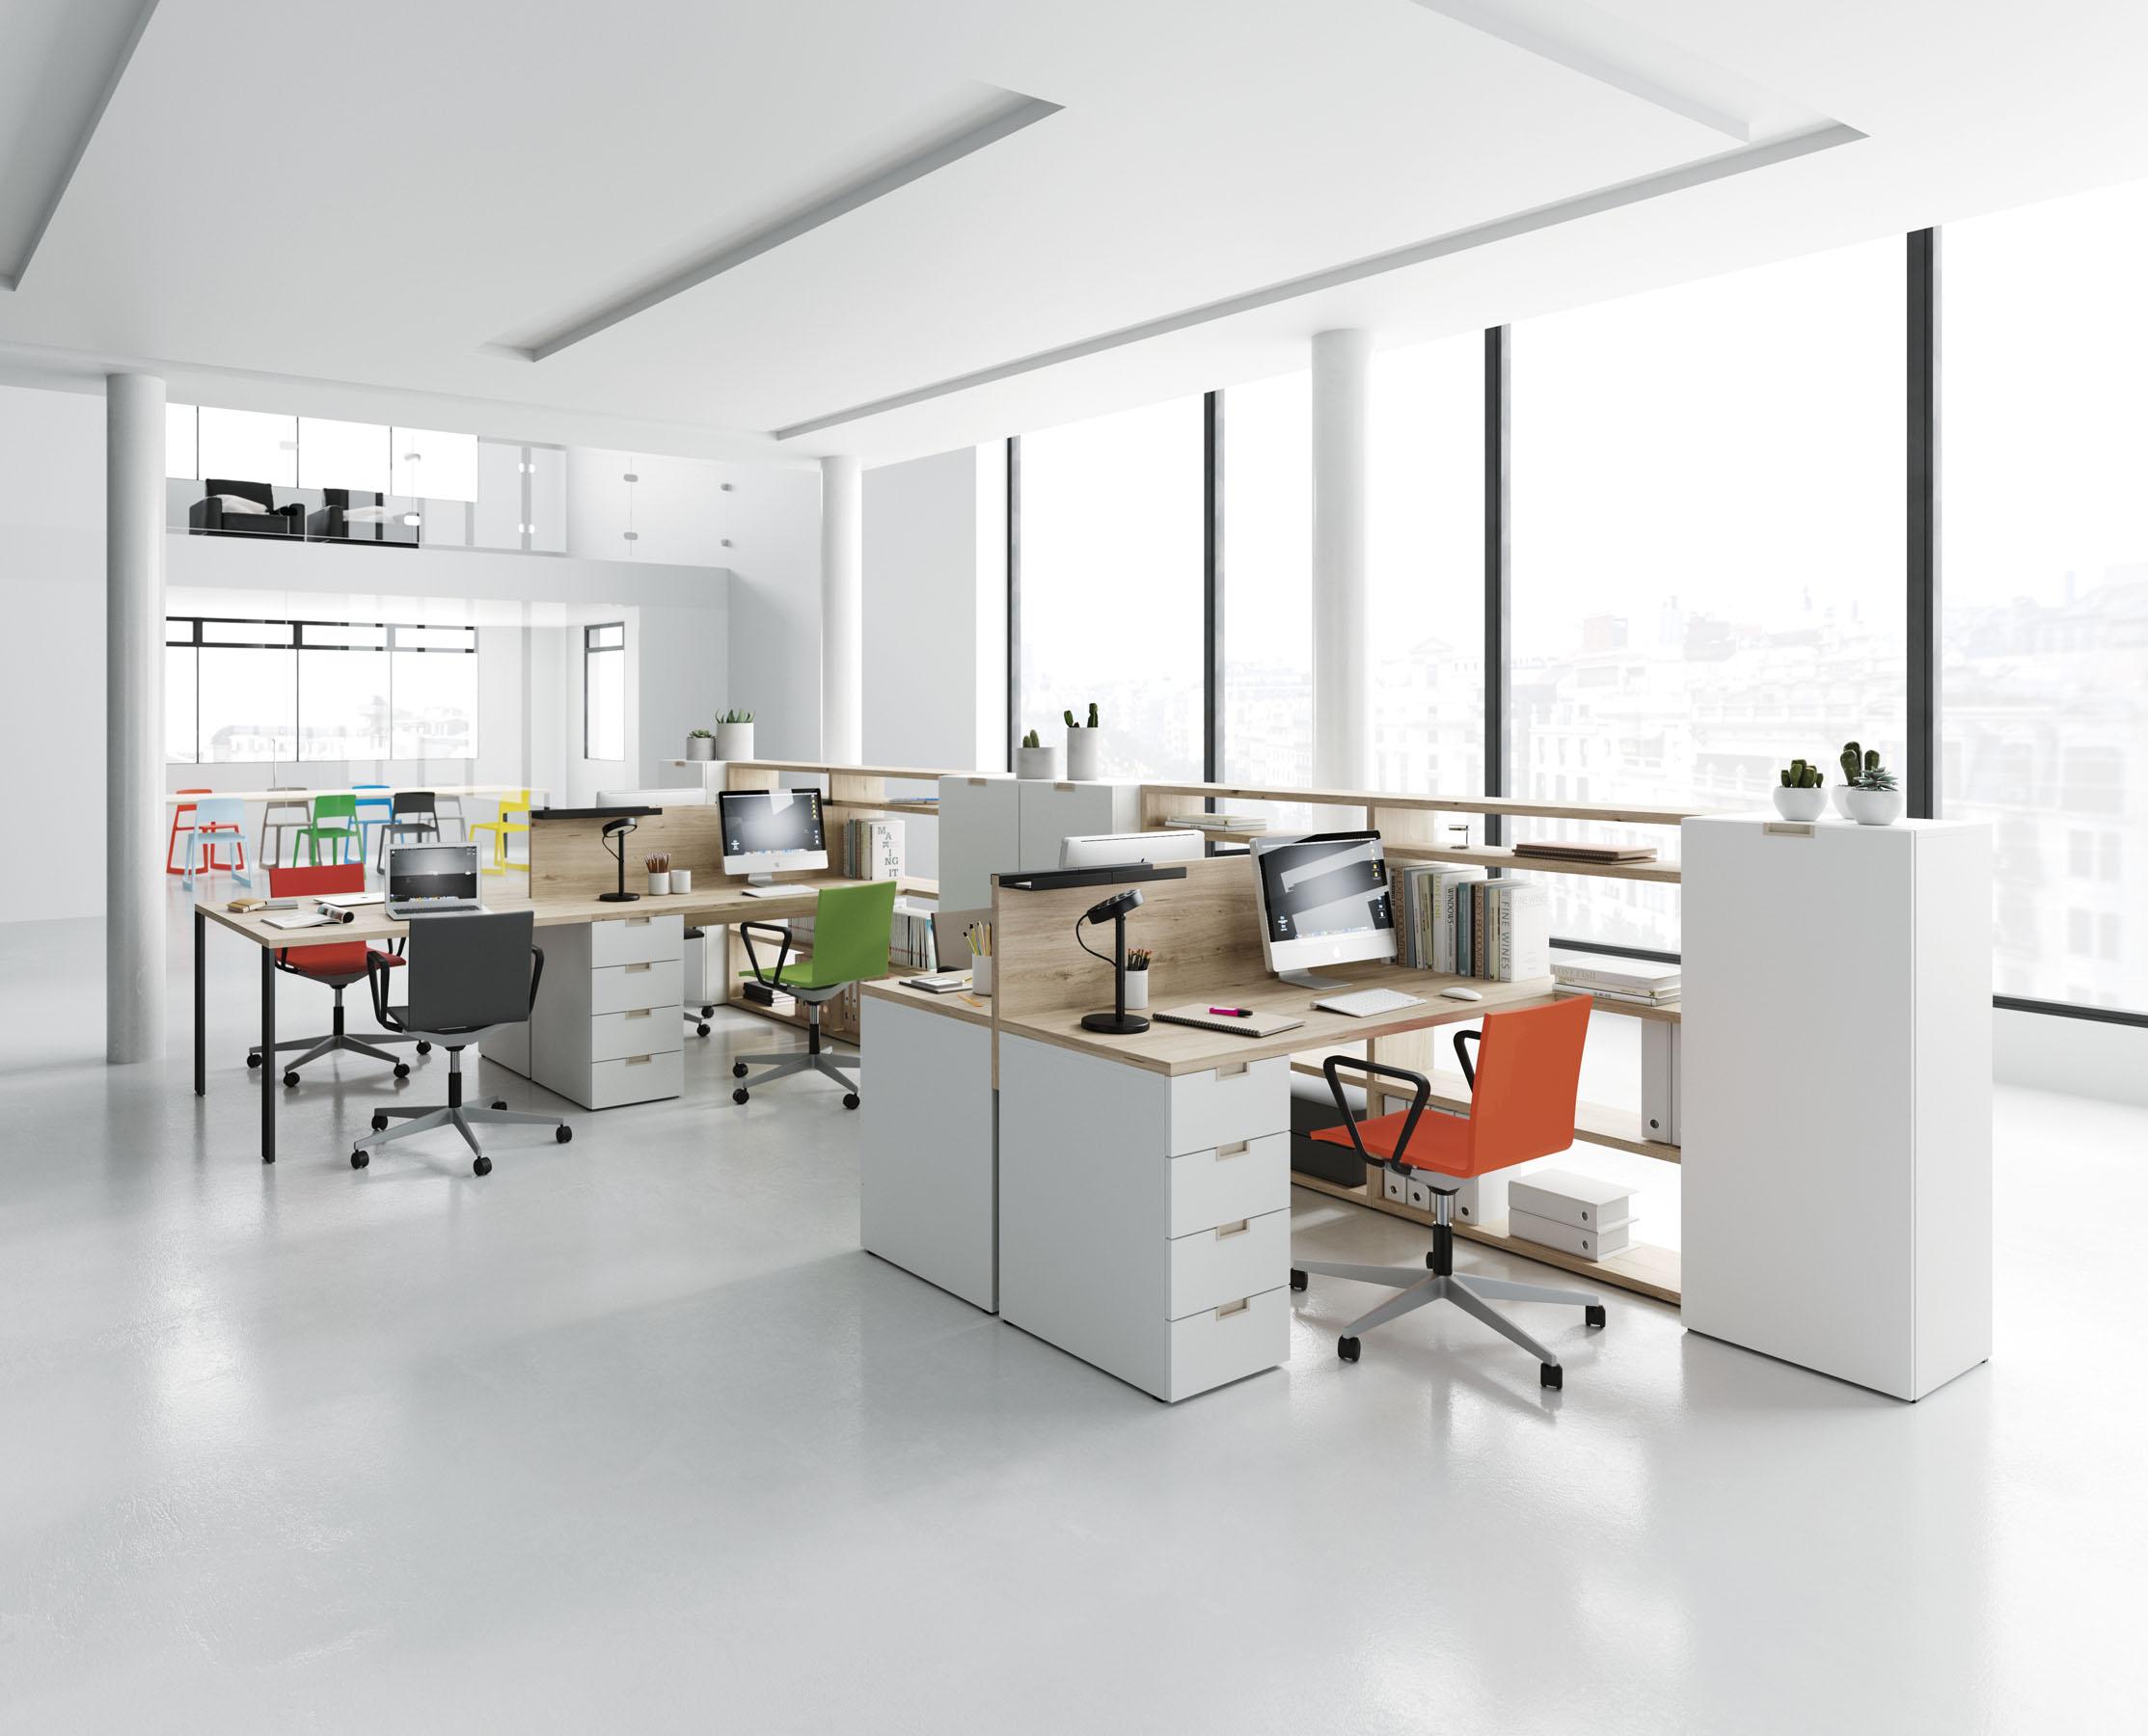 Moderūs darbo kambario baldai 54 oficina 1